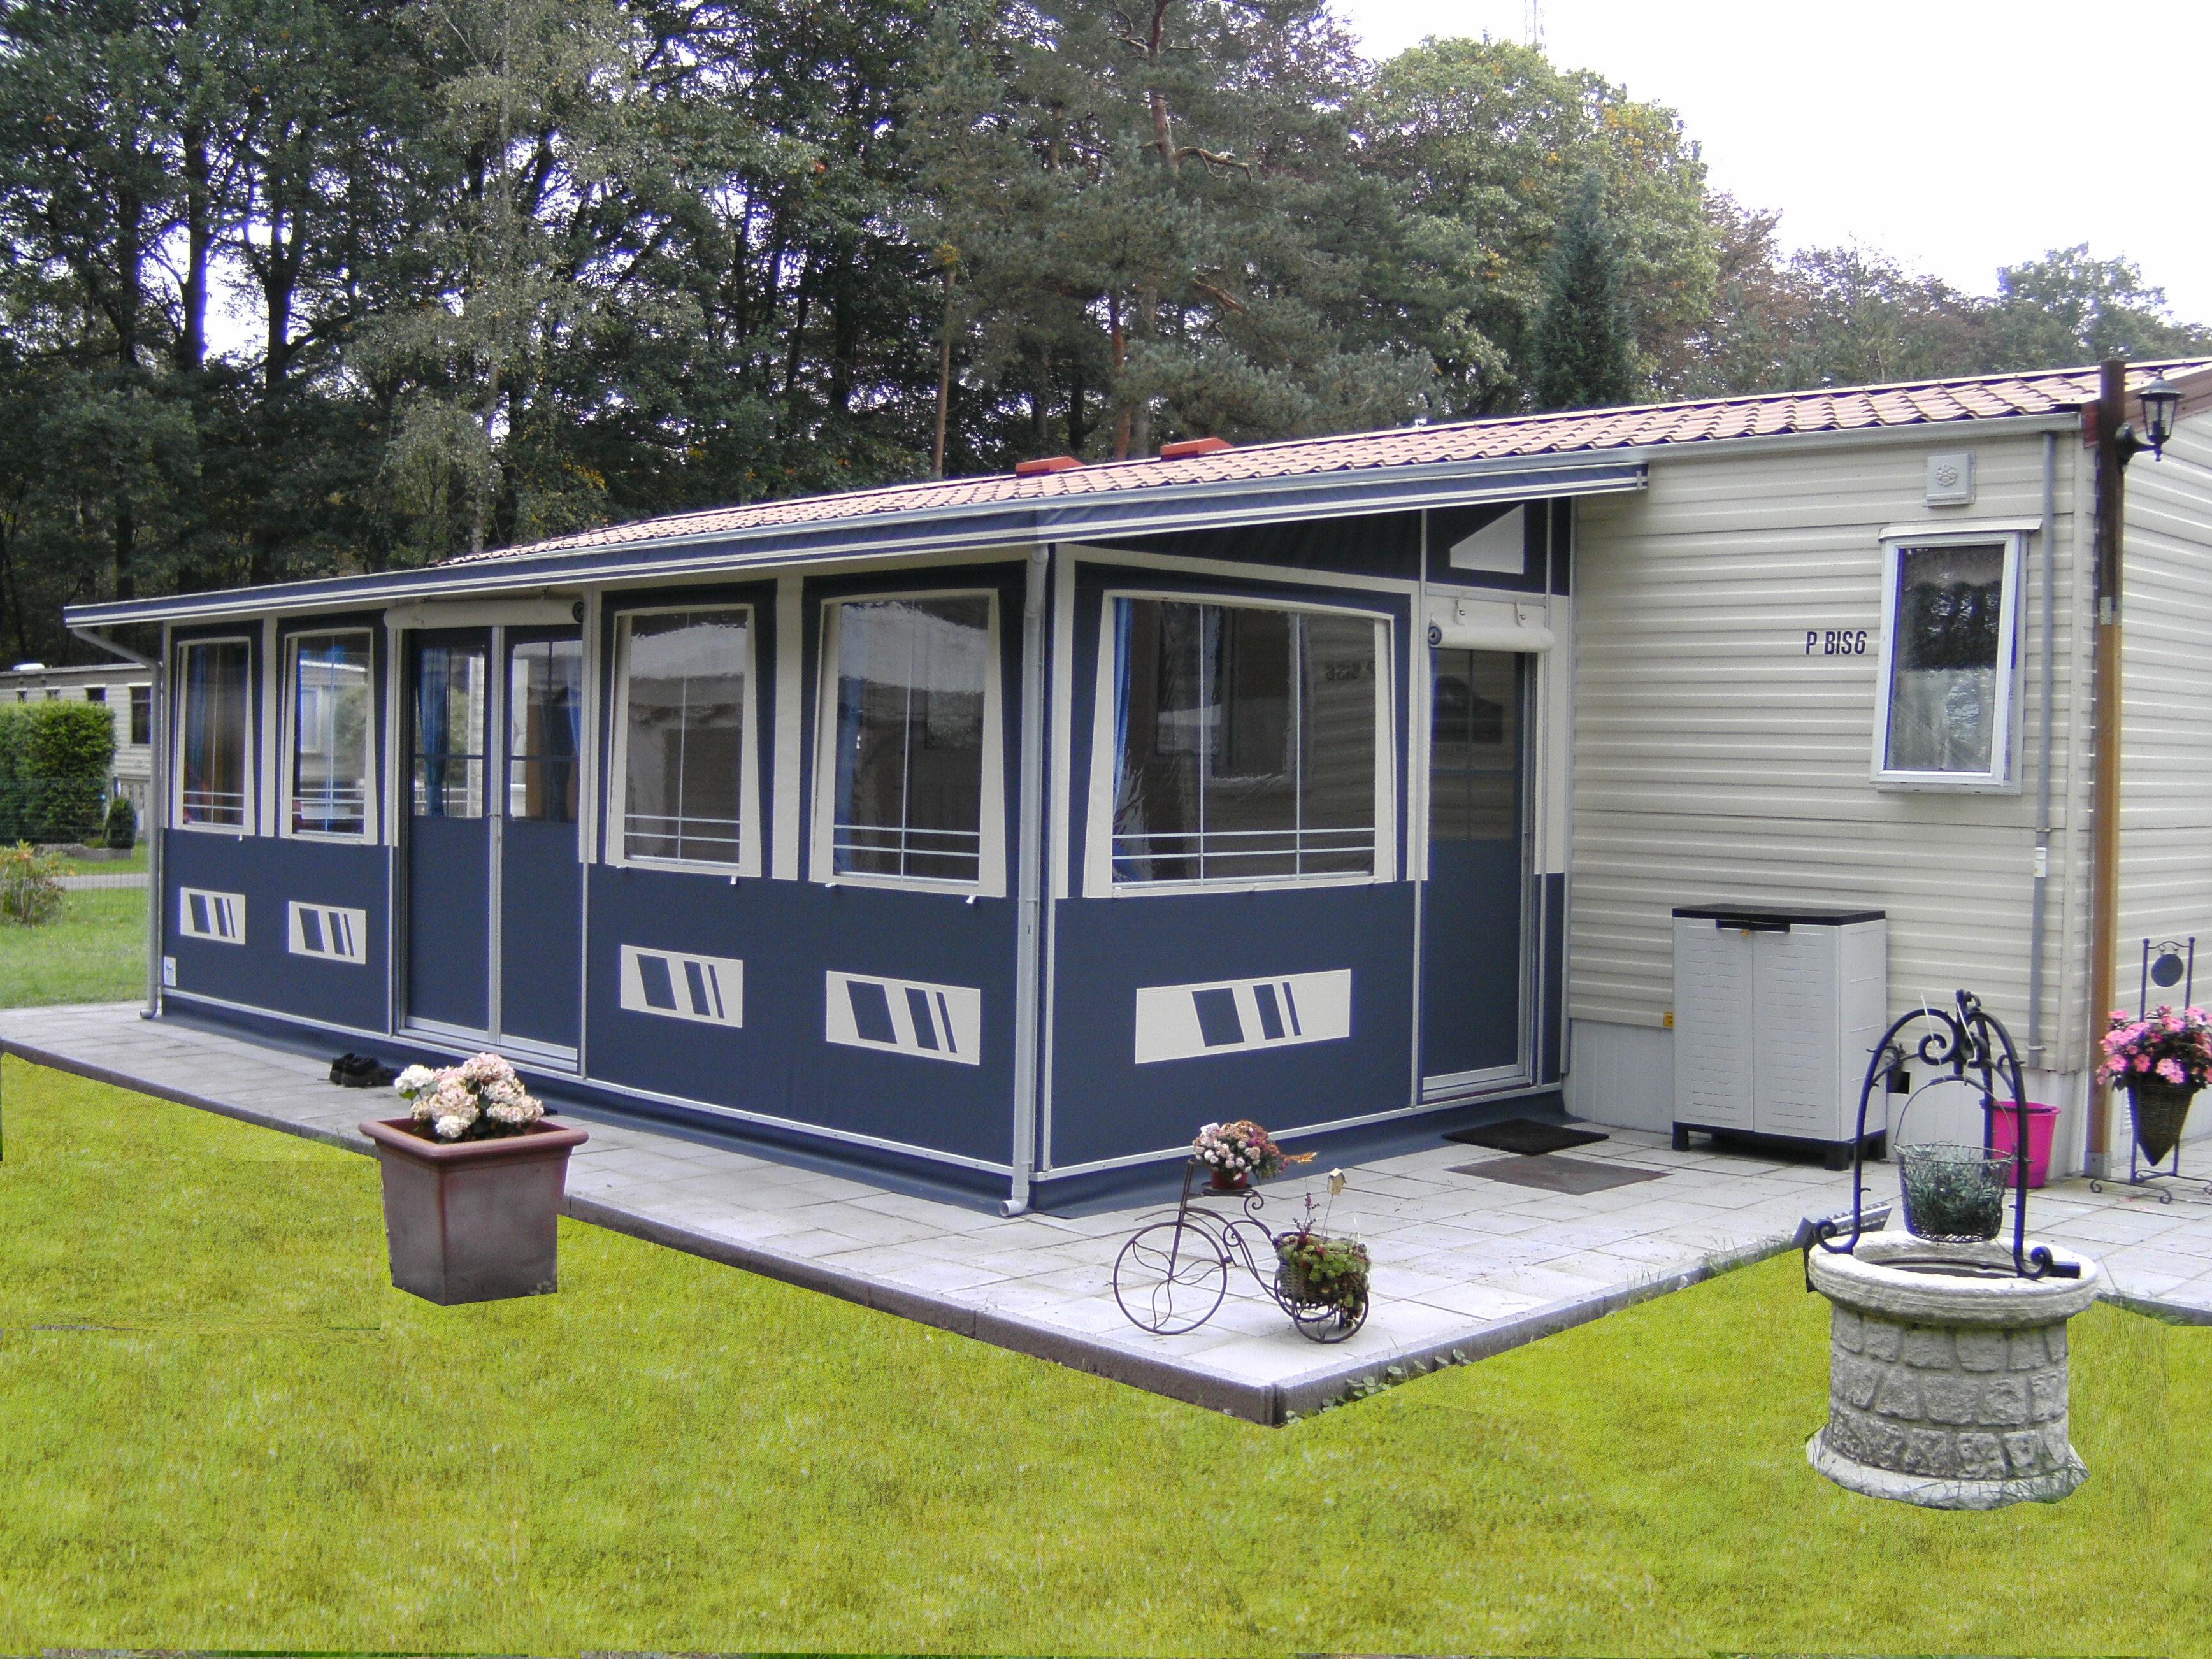 Permanent R 233 Si Levooz Caravan Awnings Garden Awnings